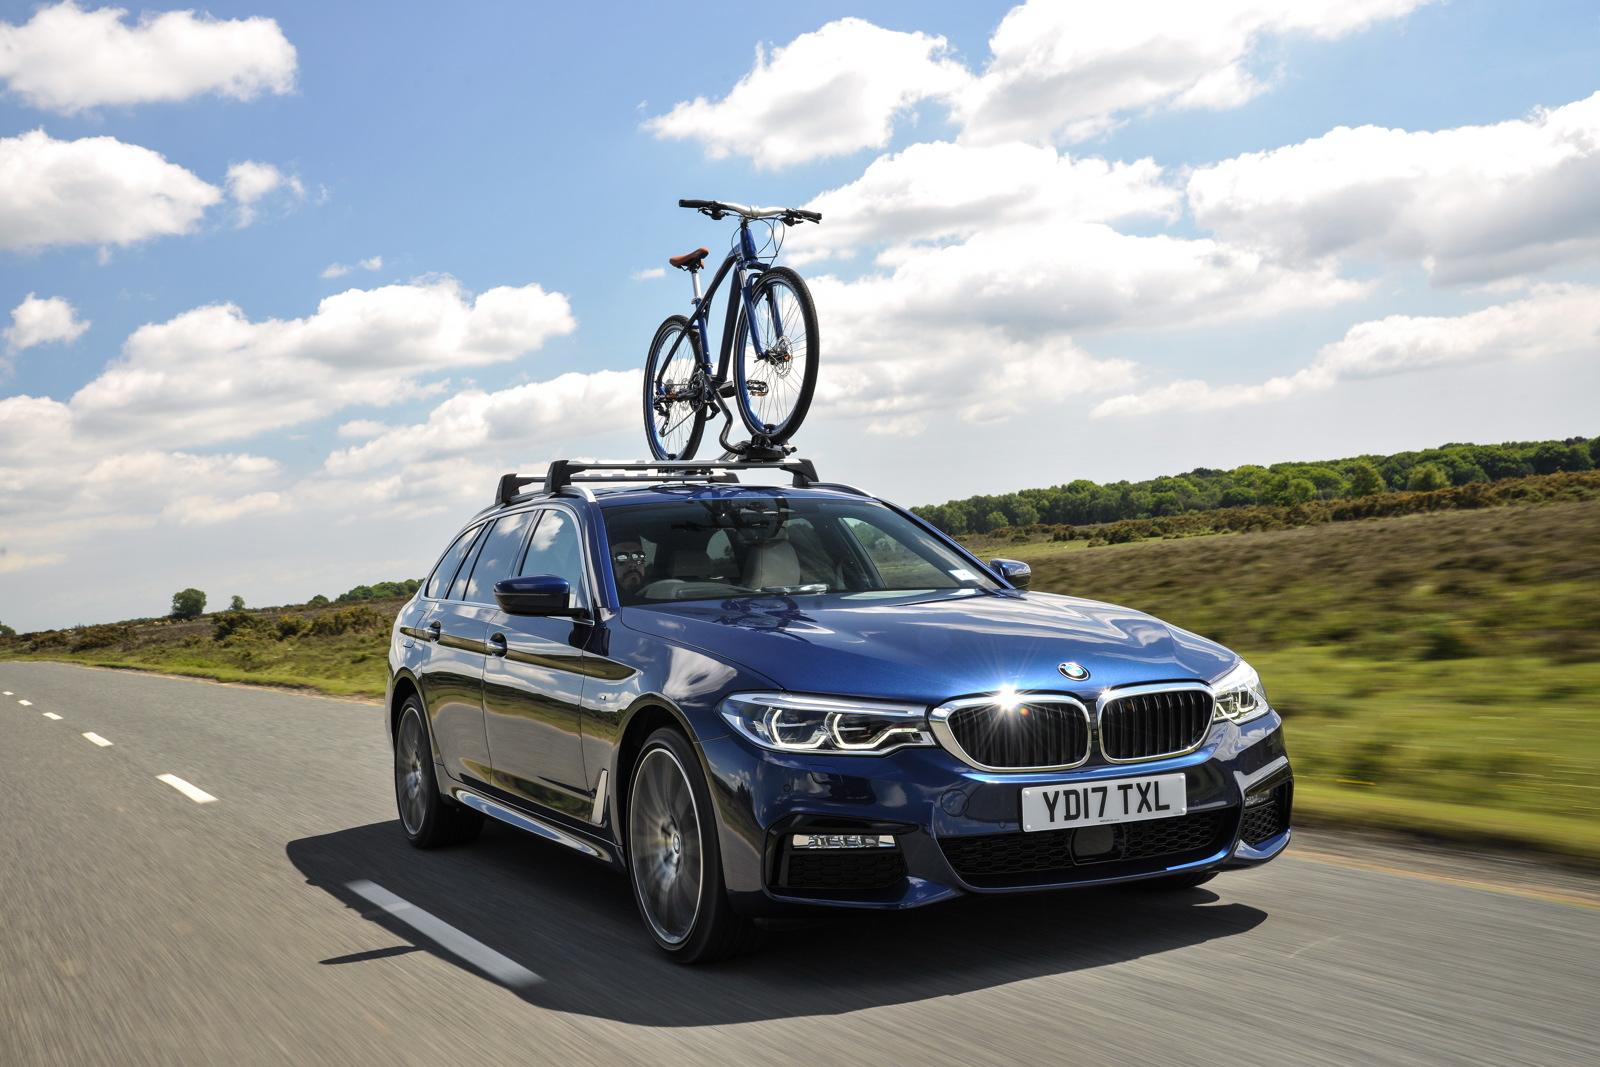 2017 BMW 5 Series Touring England 105